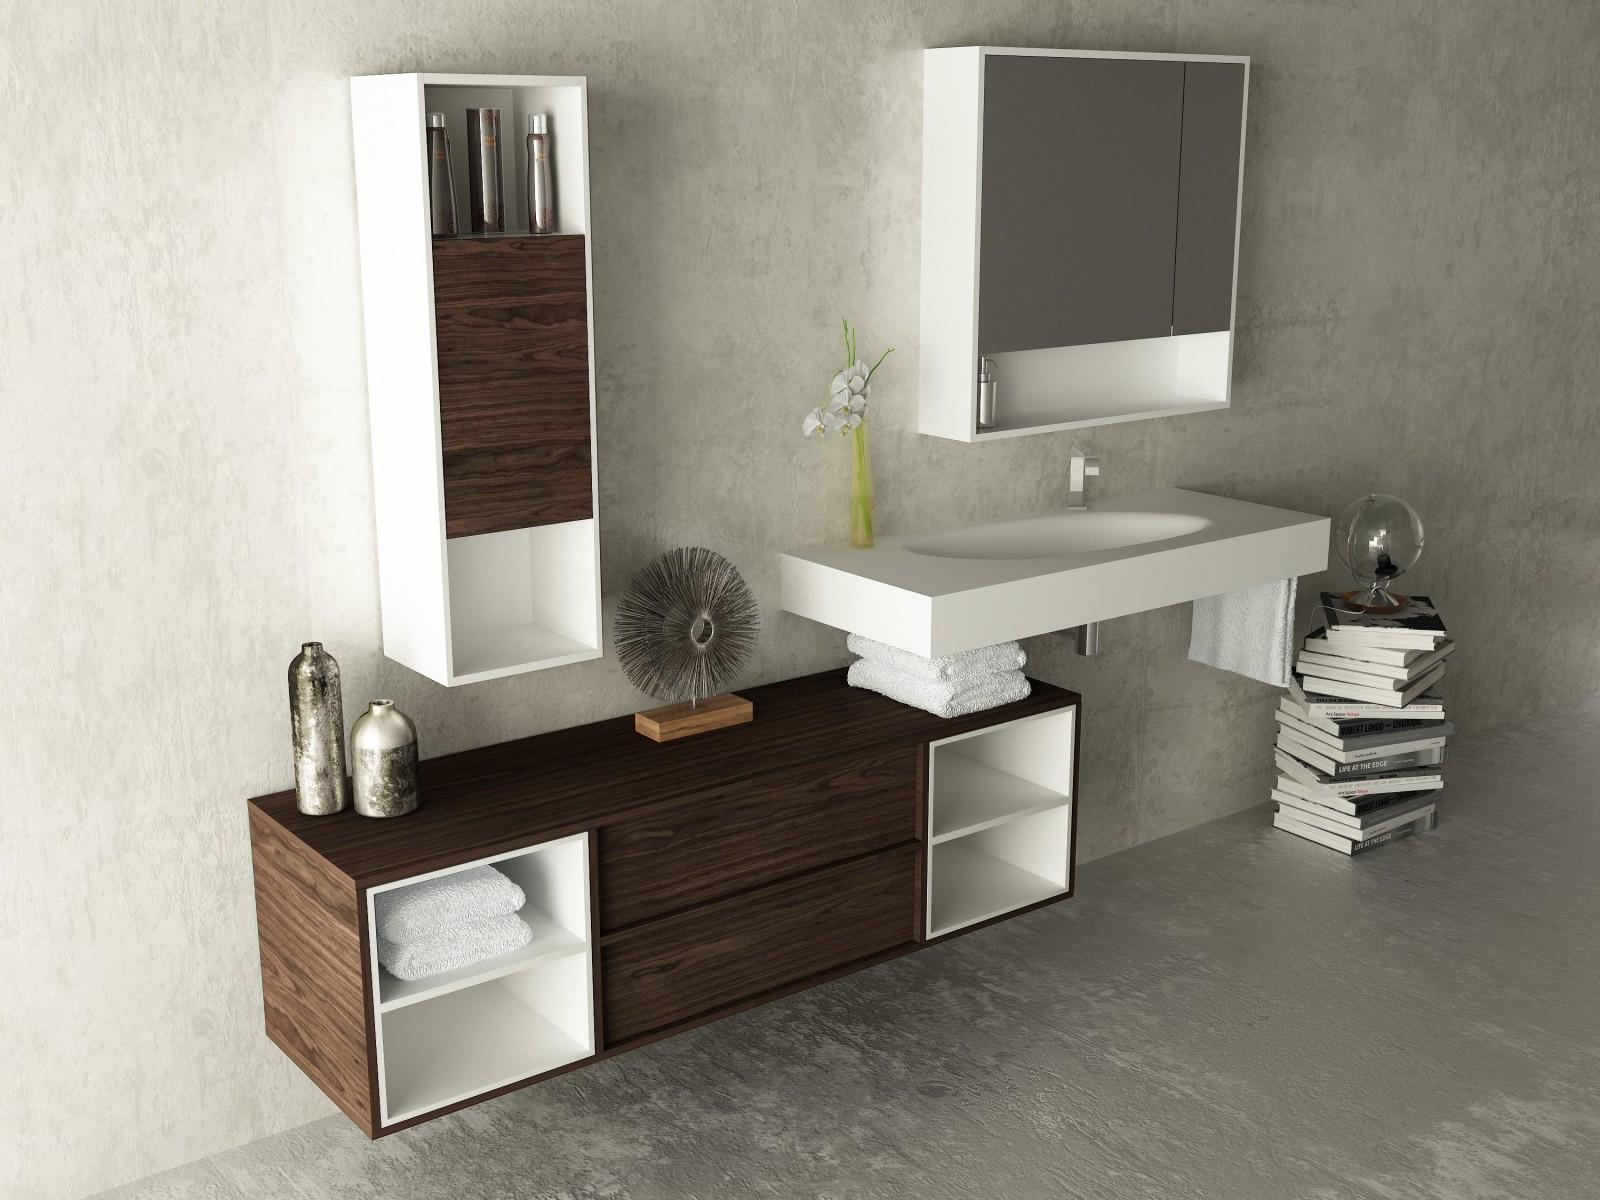 sun bajo 140 lavabo corian sun meubles salle bain ikebe usine de meubles pour la. Black Bedroom Furniture Sets. Home Design Ideas